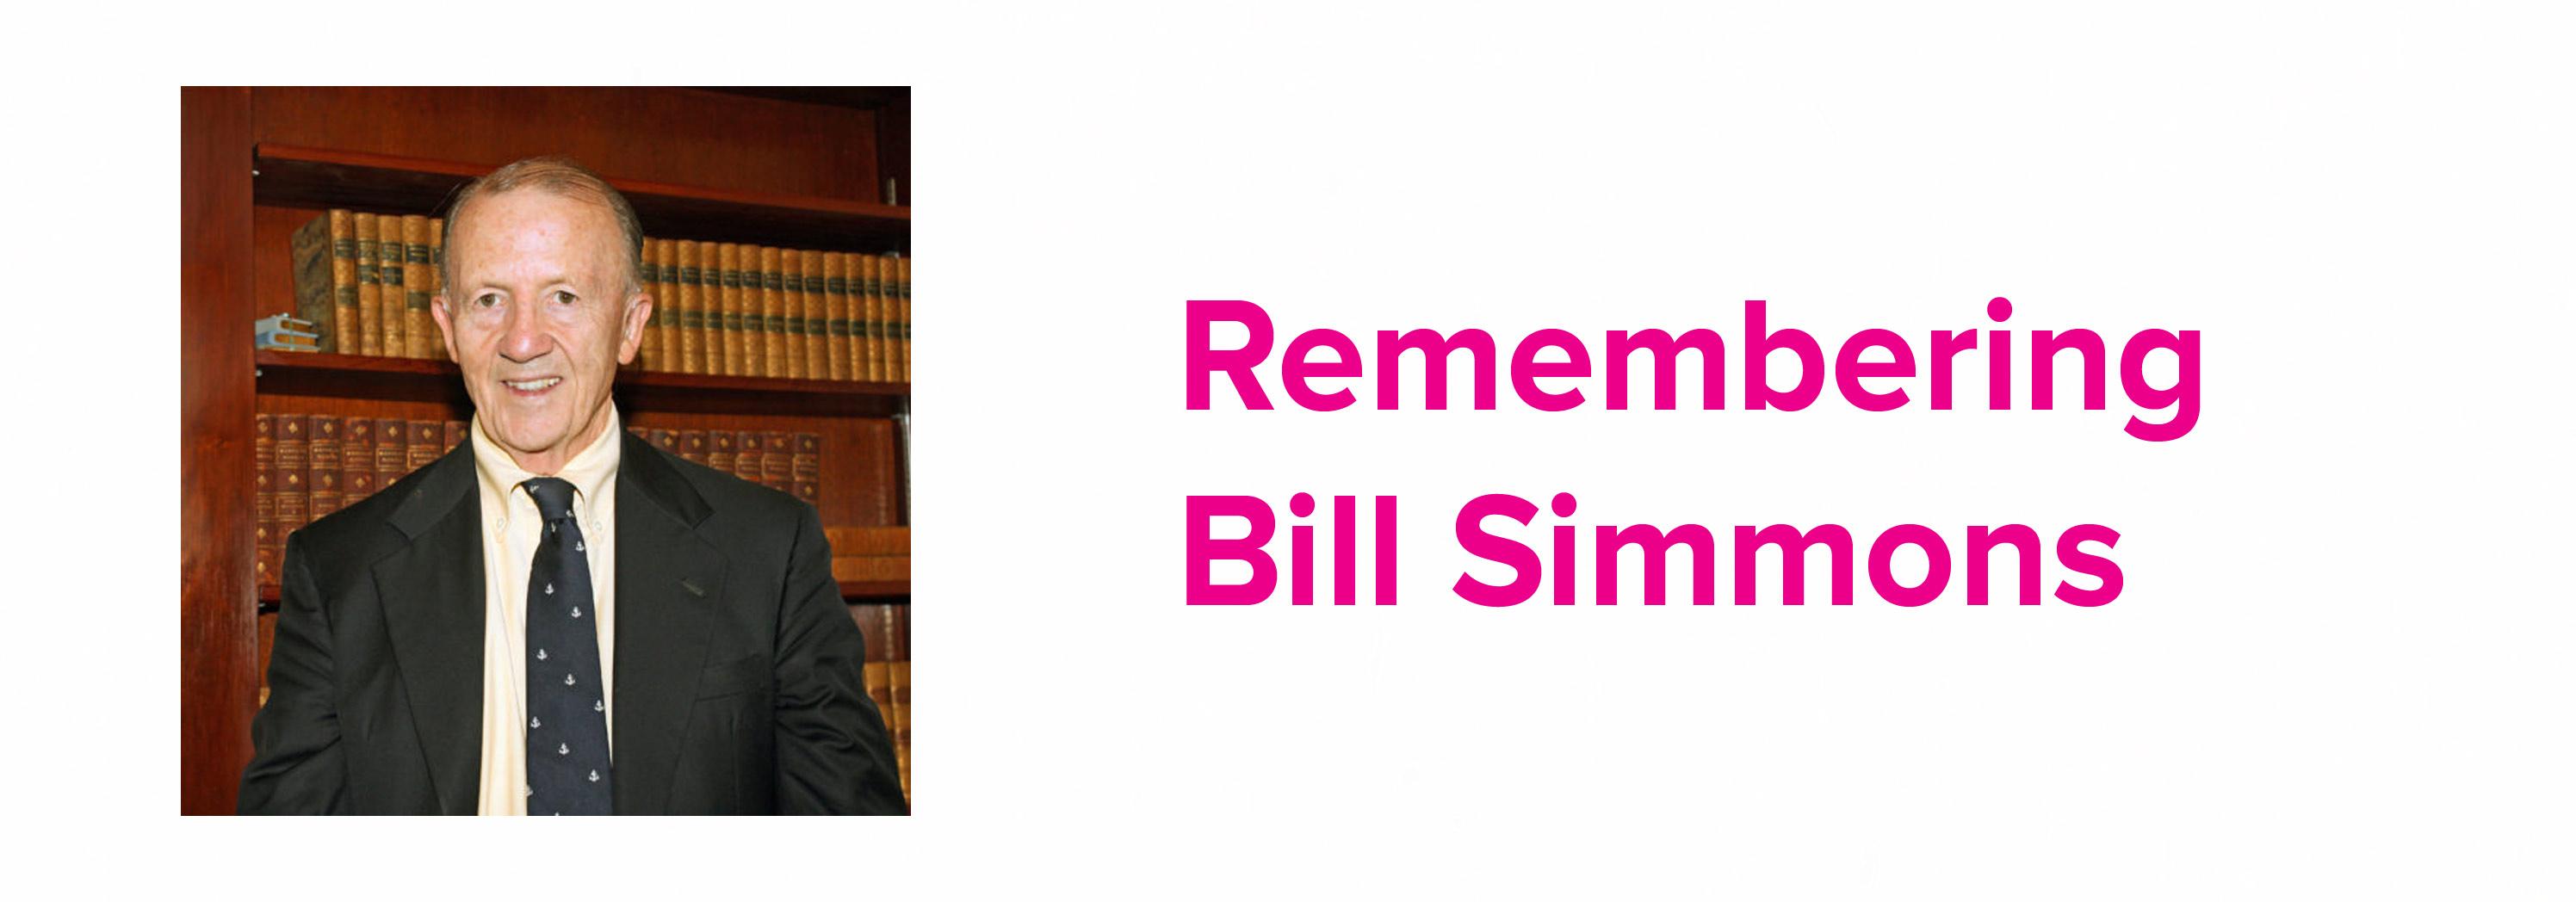 Remembering Bill Simmons